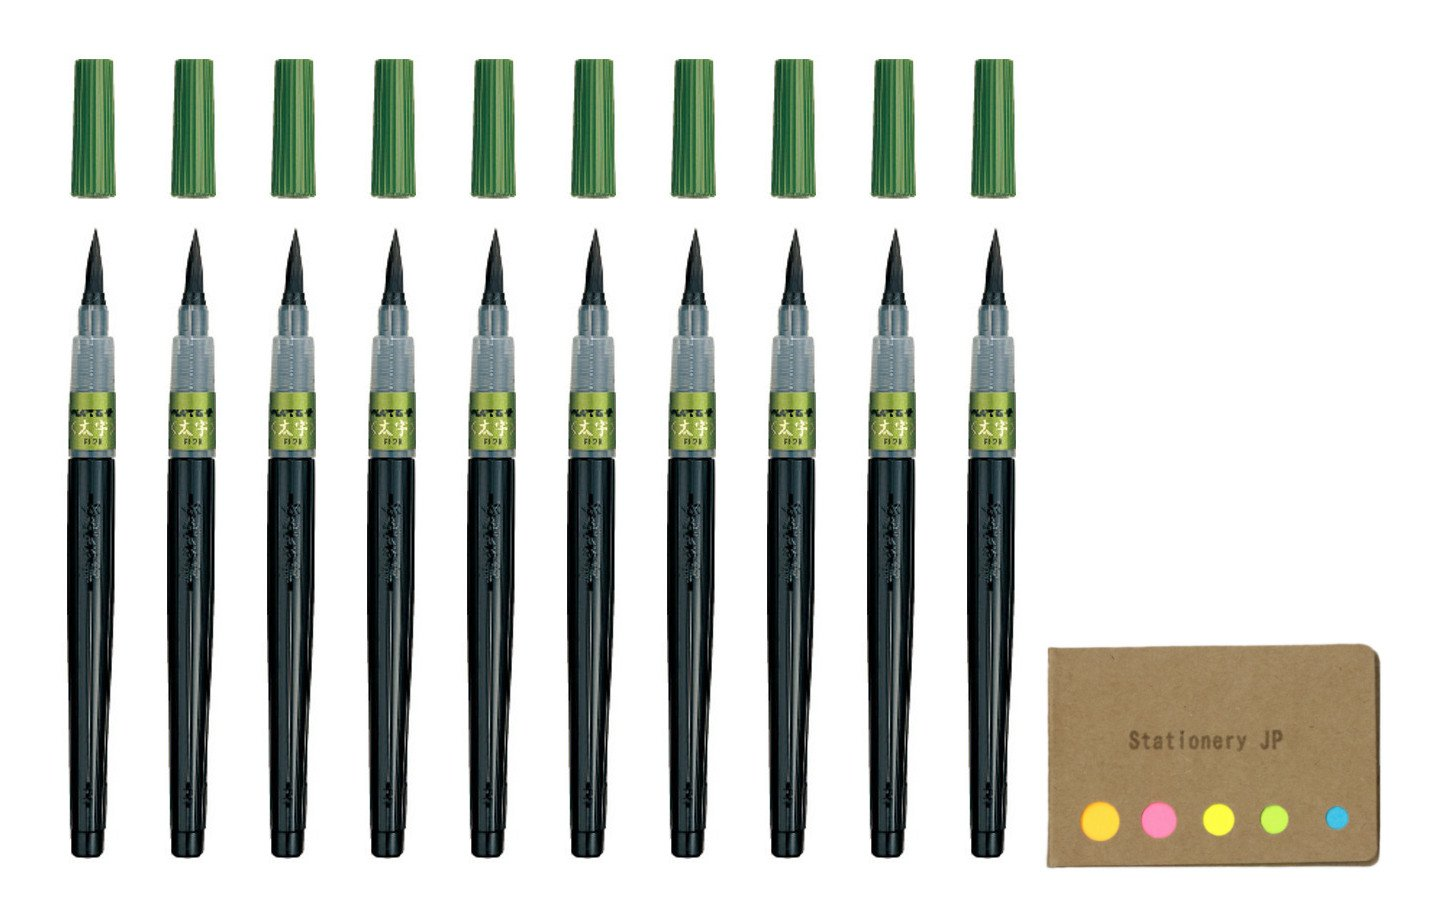 Pentel Fude Brush Pen, Bold, 10-pack, Sticky Notes Value Set